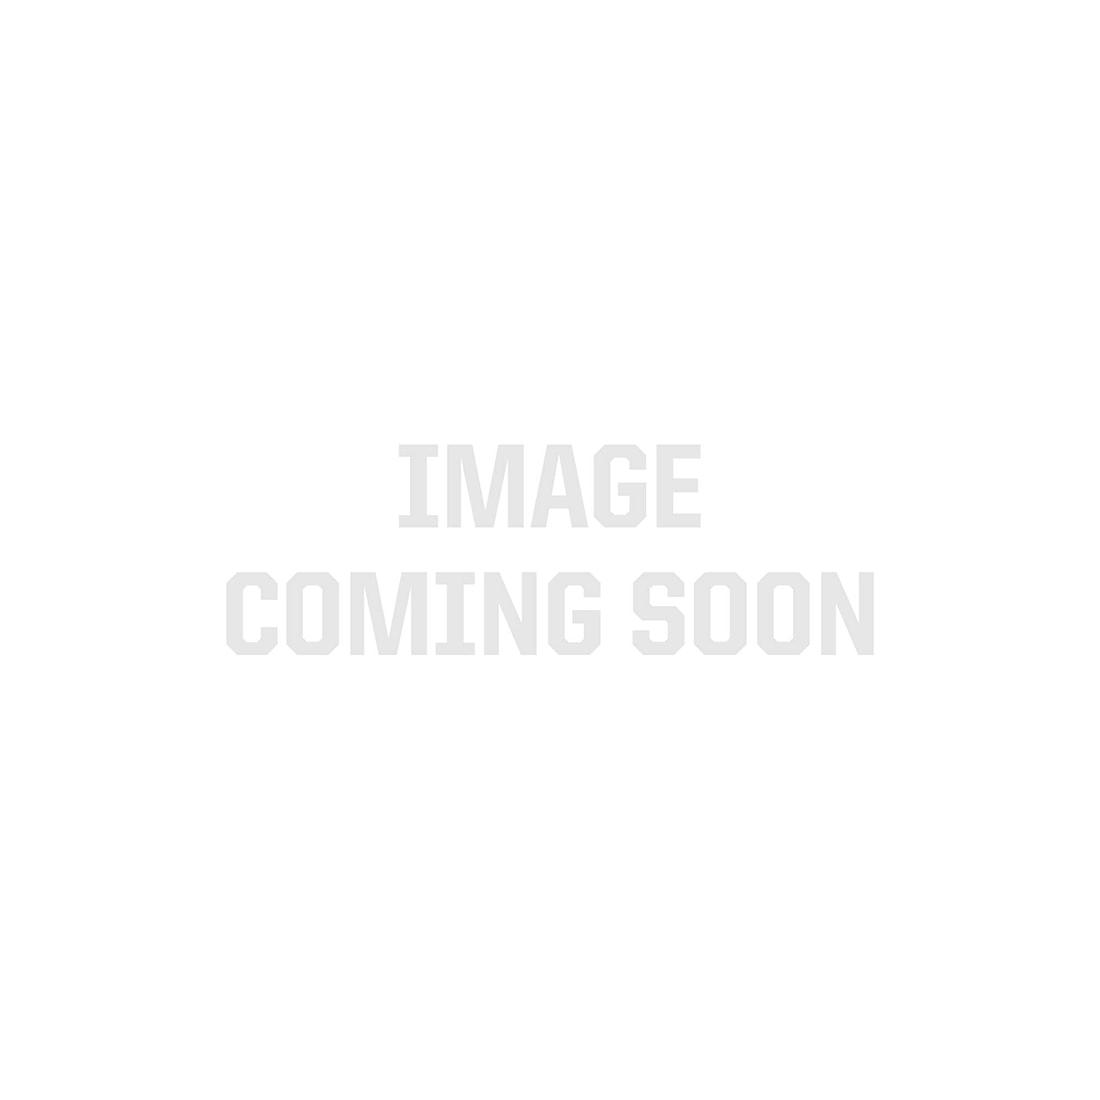 TruColor 2835 CurrentControl LED Strip Light - 6,500K - 160/m - CurrentControl - 1 Foot